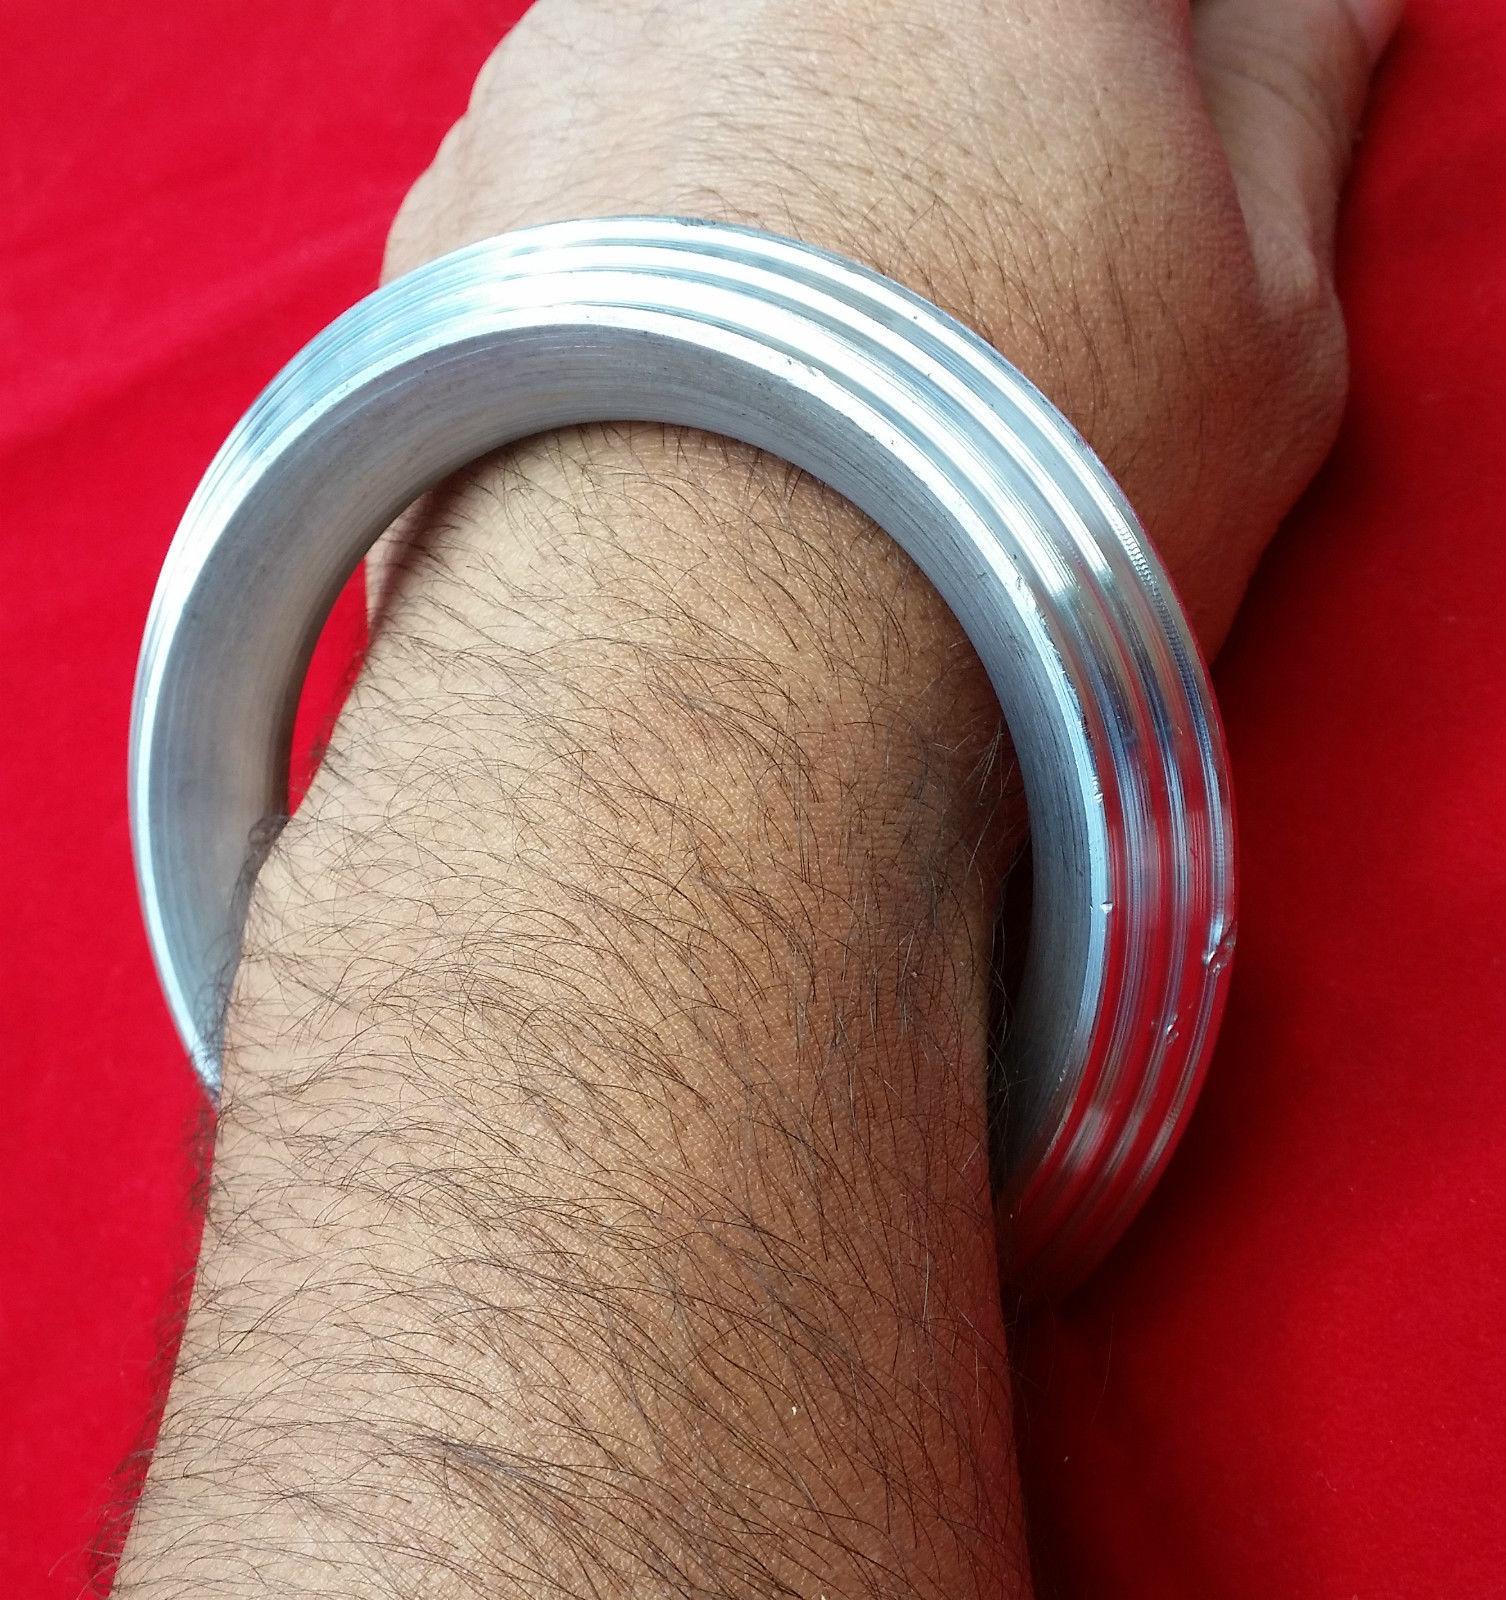 S1 Extra Grueso Siete Líneas SARBLOH ACERO Hierro Puro Sij Singh Khalsa Pesado